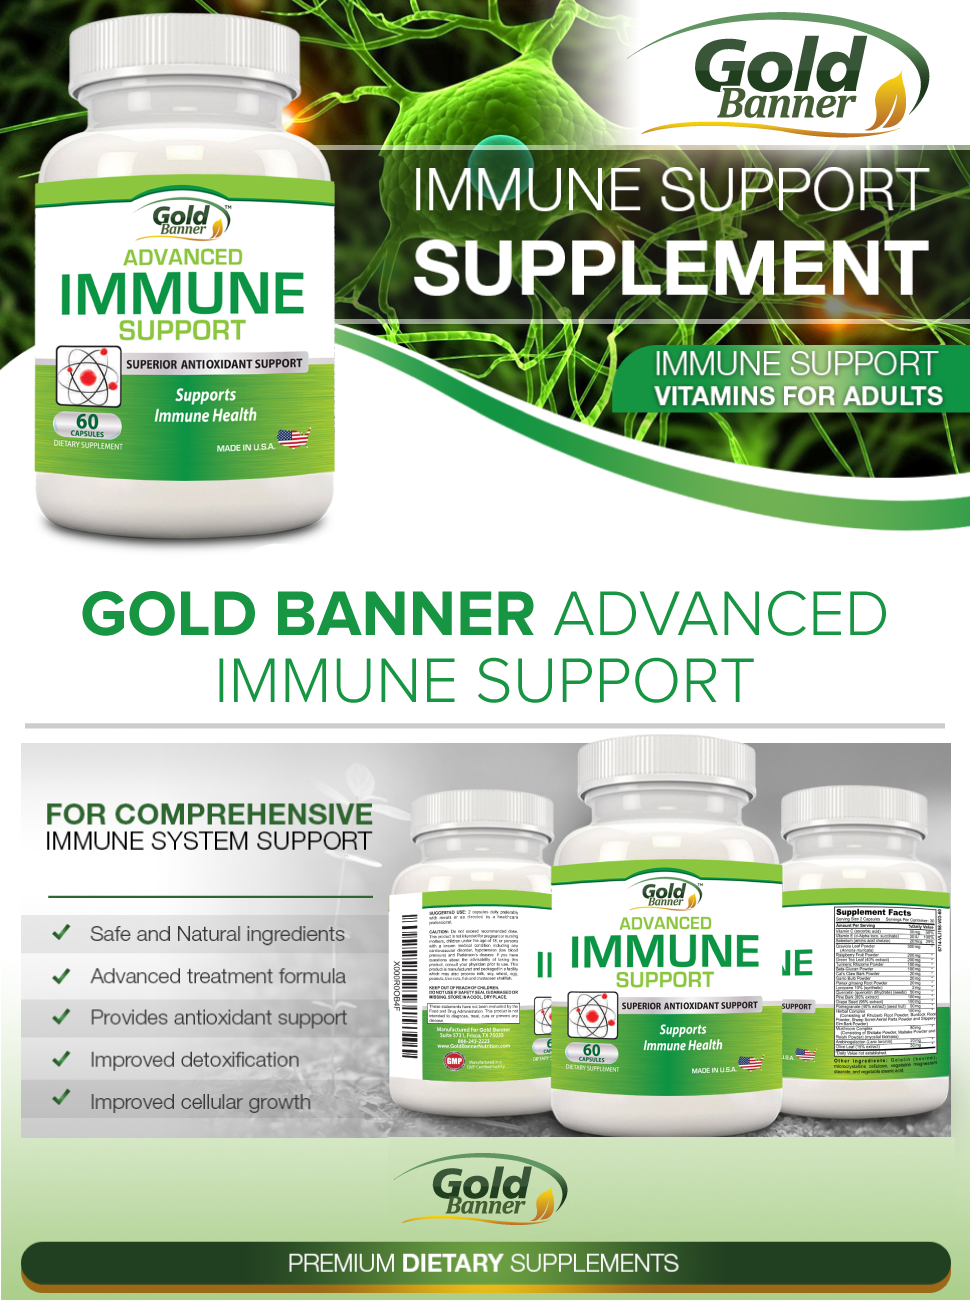 Gold Banner Advanced Immune Support